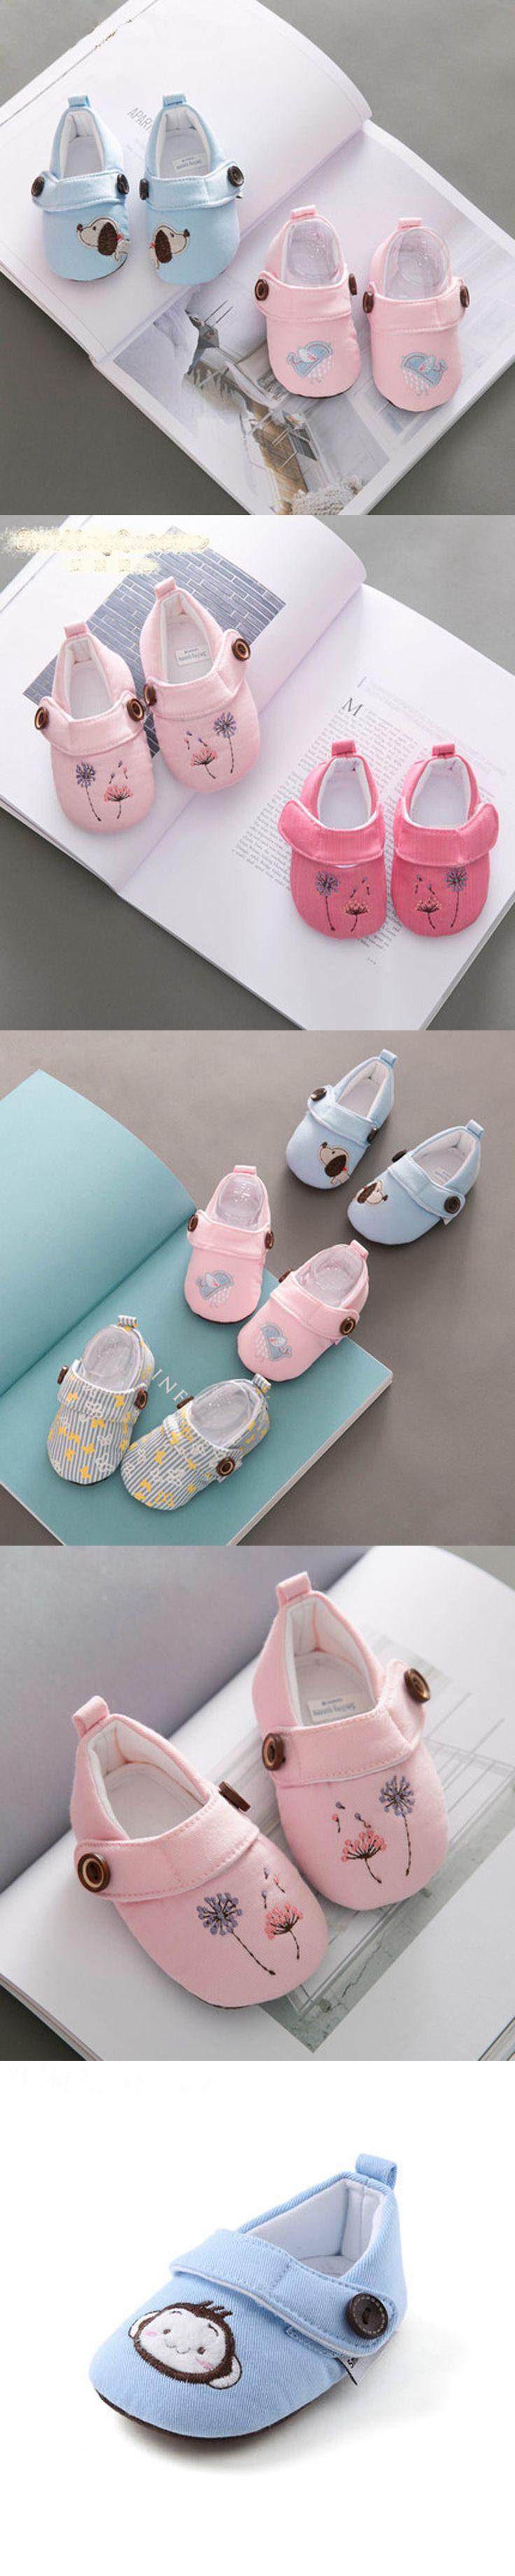 Children Footwear Baby Shoes Brand Newborn baby Girls shoes Boys Kid Sports Sneakers Infant Sapatos Newborn Baby Schoenen meisje $31.8